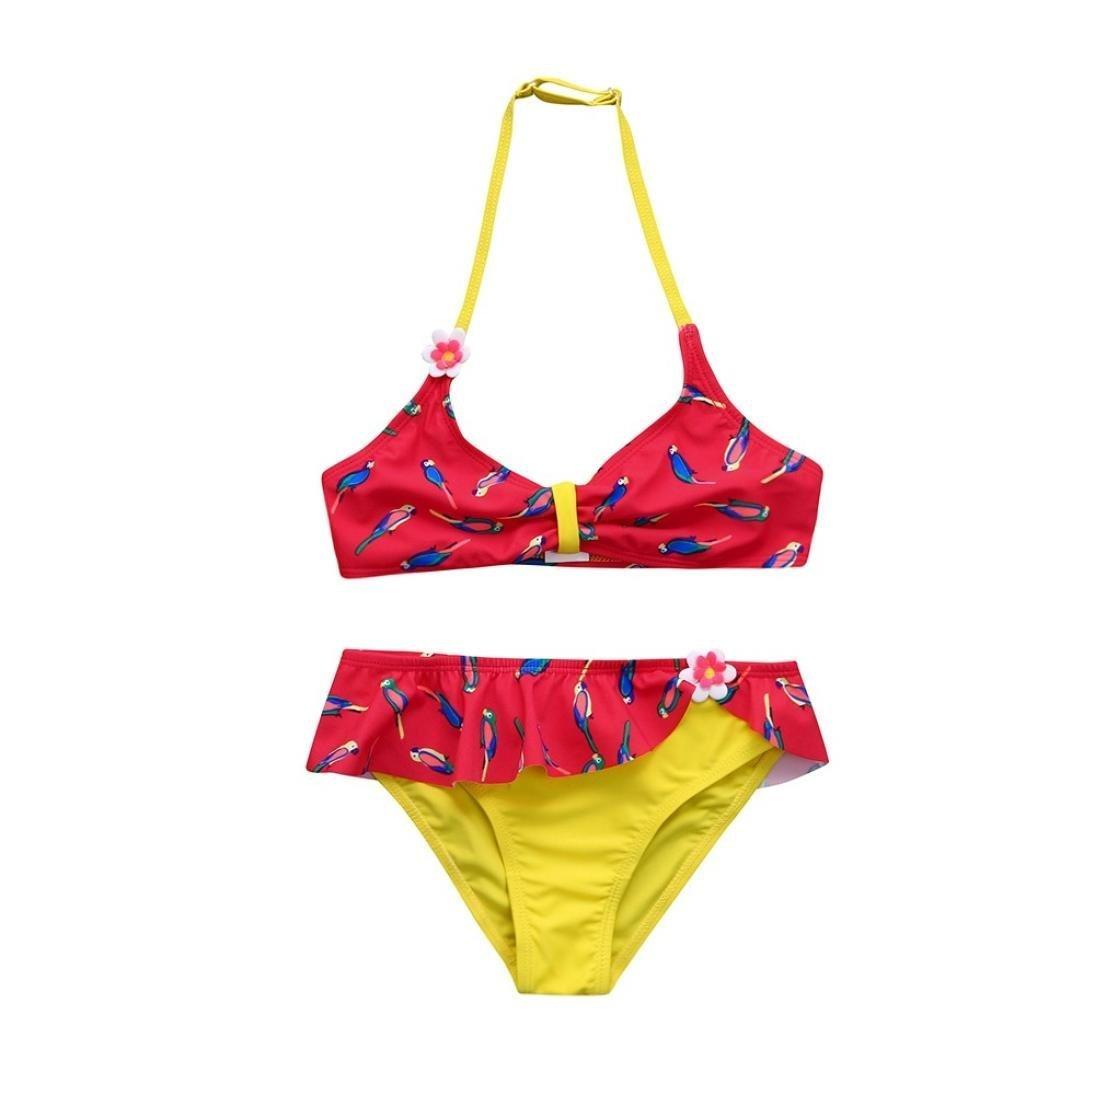 Infant Kids Girls Adjustable Strap Floral Ruched Swimwear High Waist Beach Swimsuit Bikini Bathing Suit Set Aritone